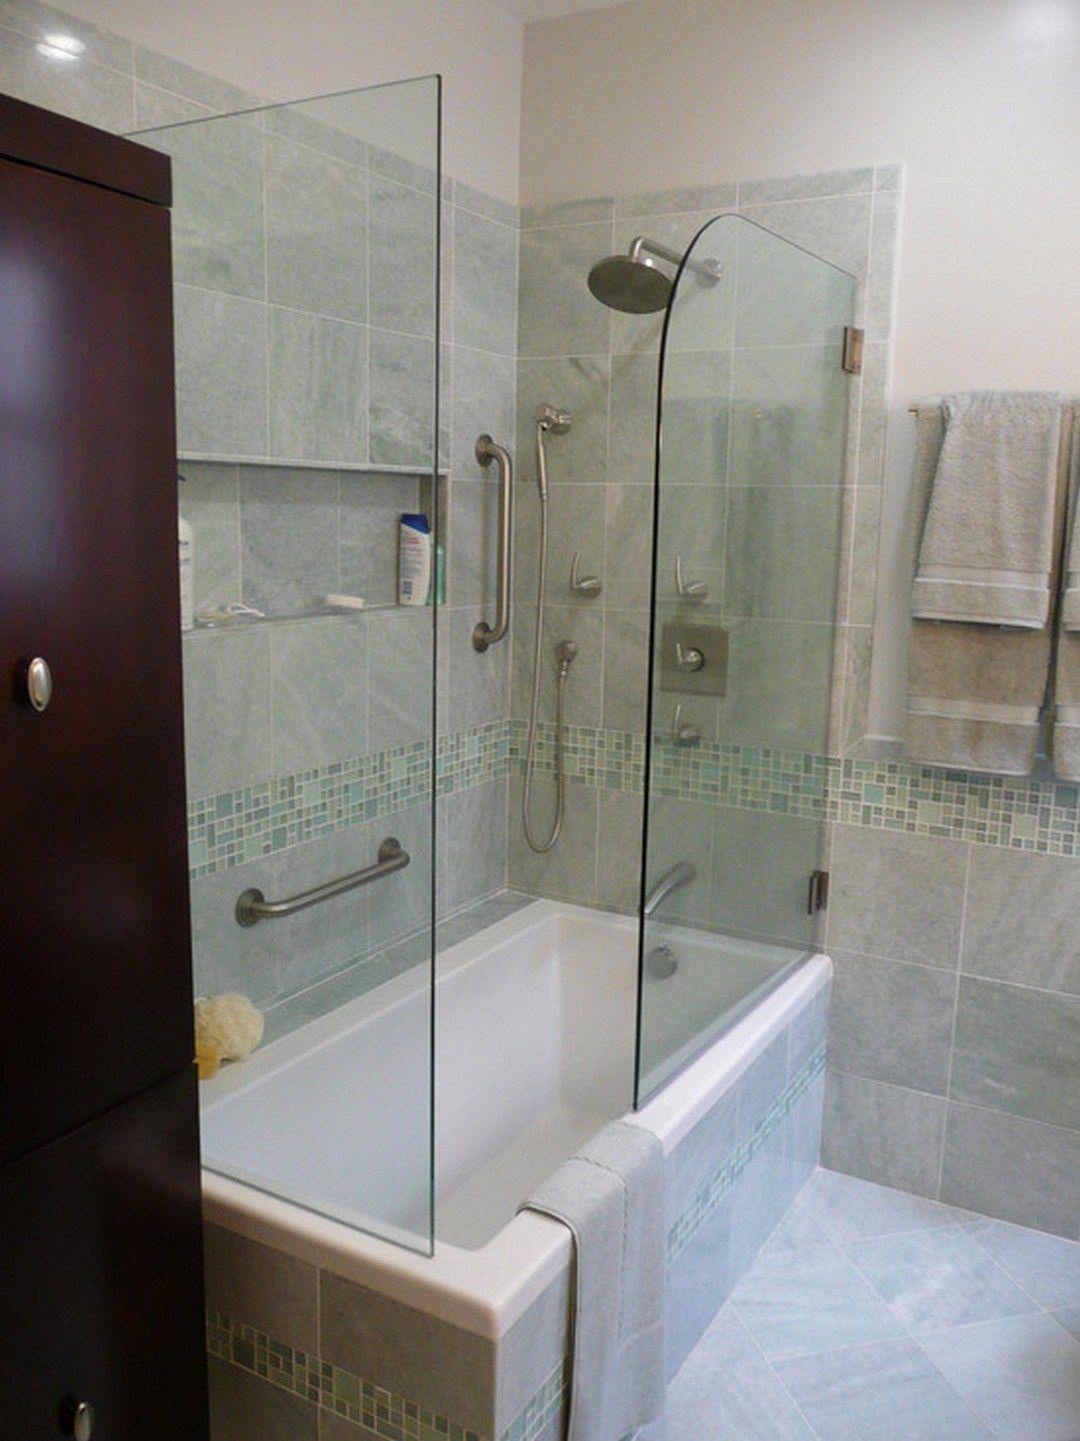 99 Small Bathroom Tub Shower Combo Remodeling Ideas 39  Tub Enchanting Small Bathroom With Tub And Shower Design Decoration